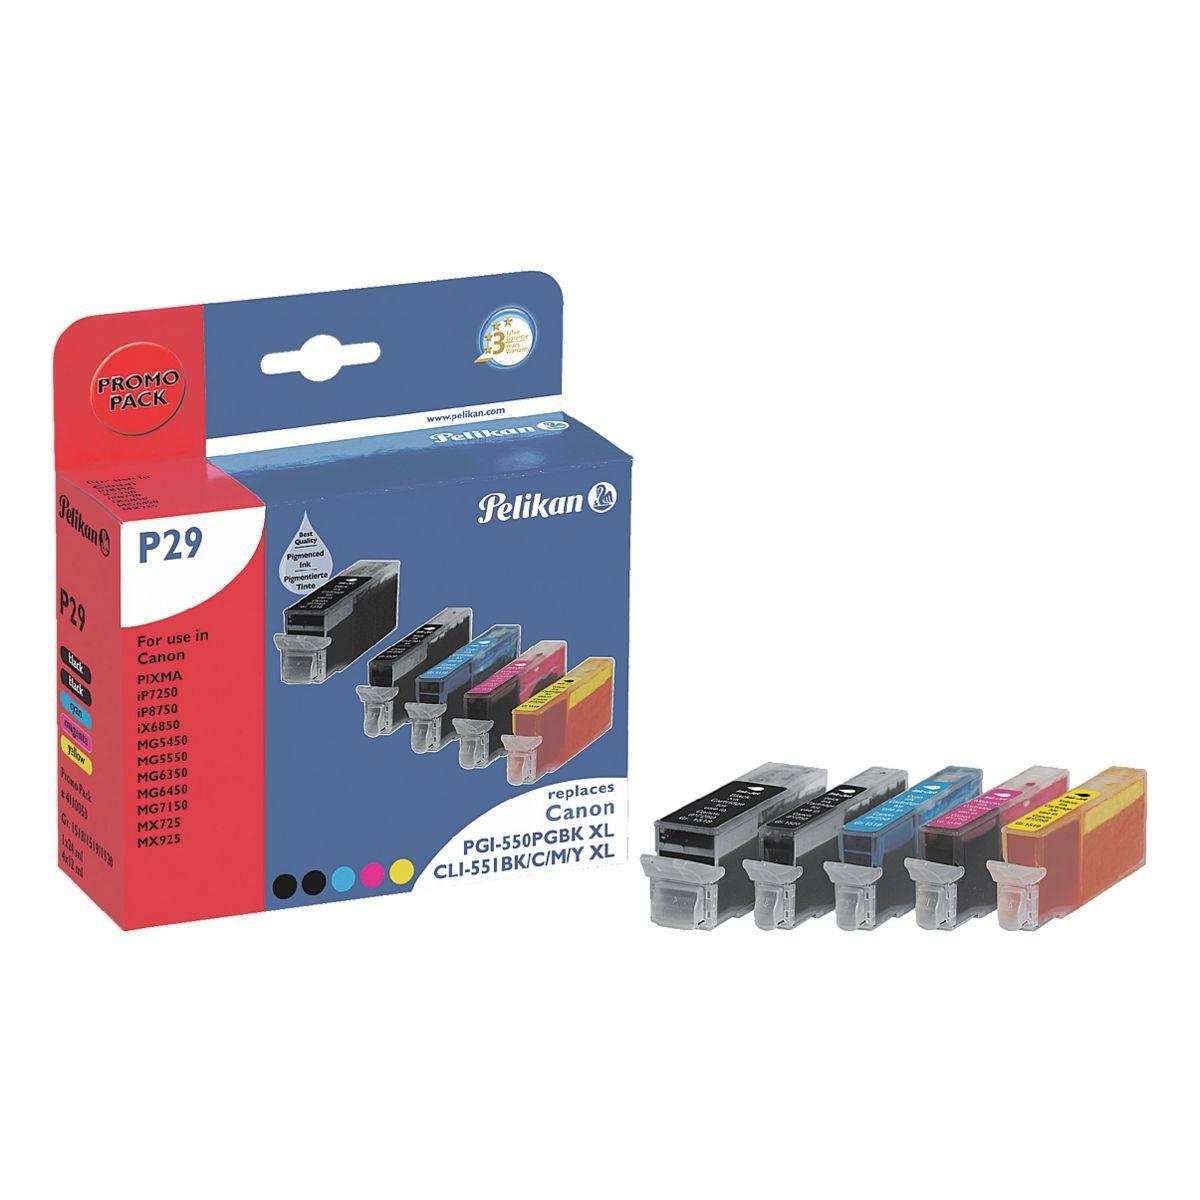 Pelikan Tintenpatronen-Set ersetzt Canon »PGI-550PGBK XL & ...